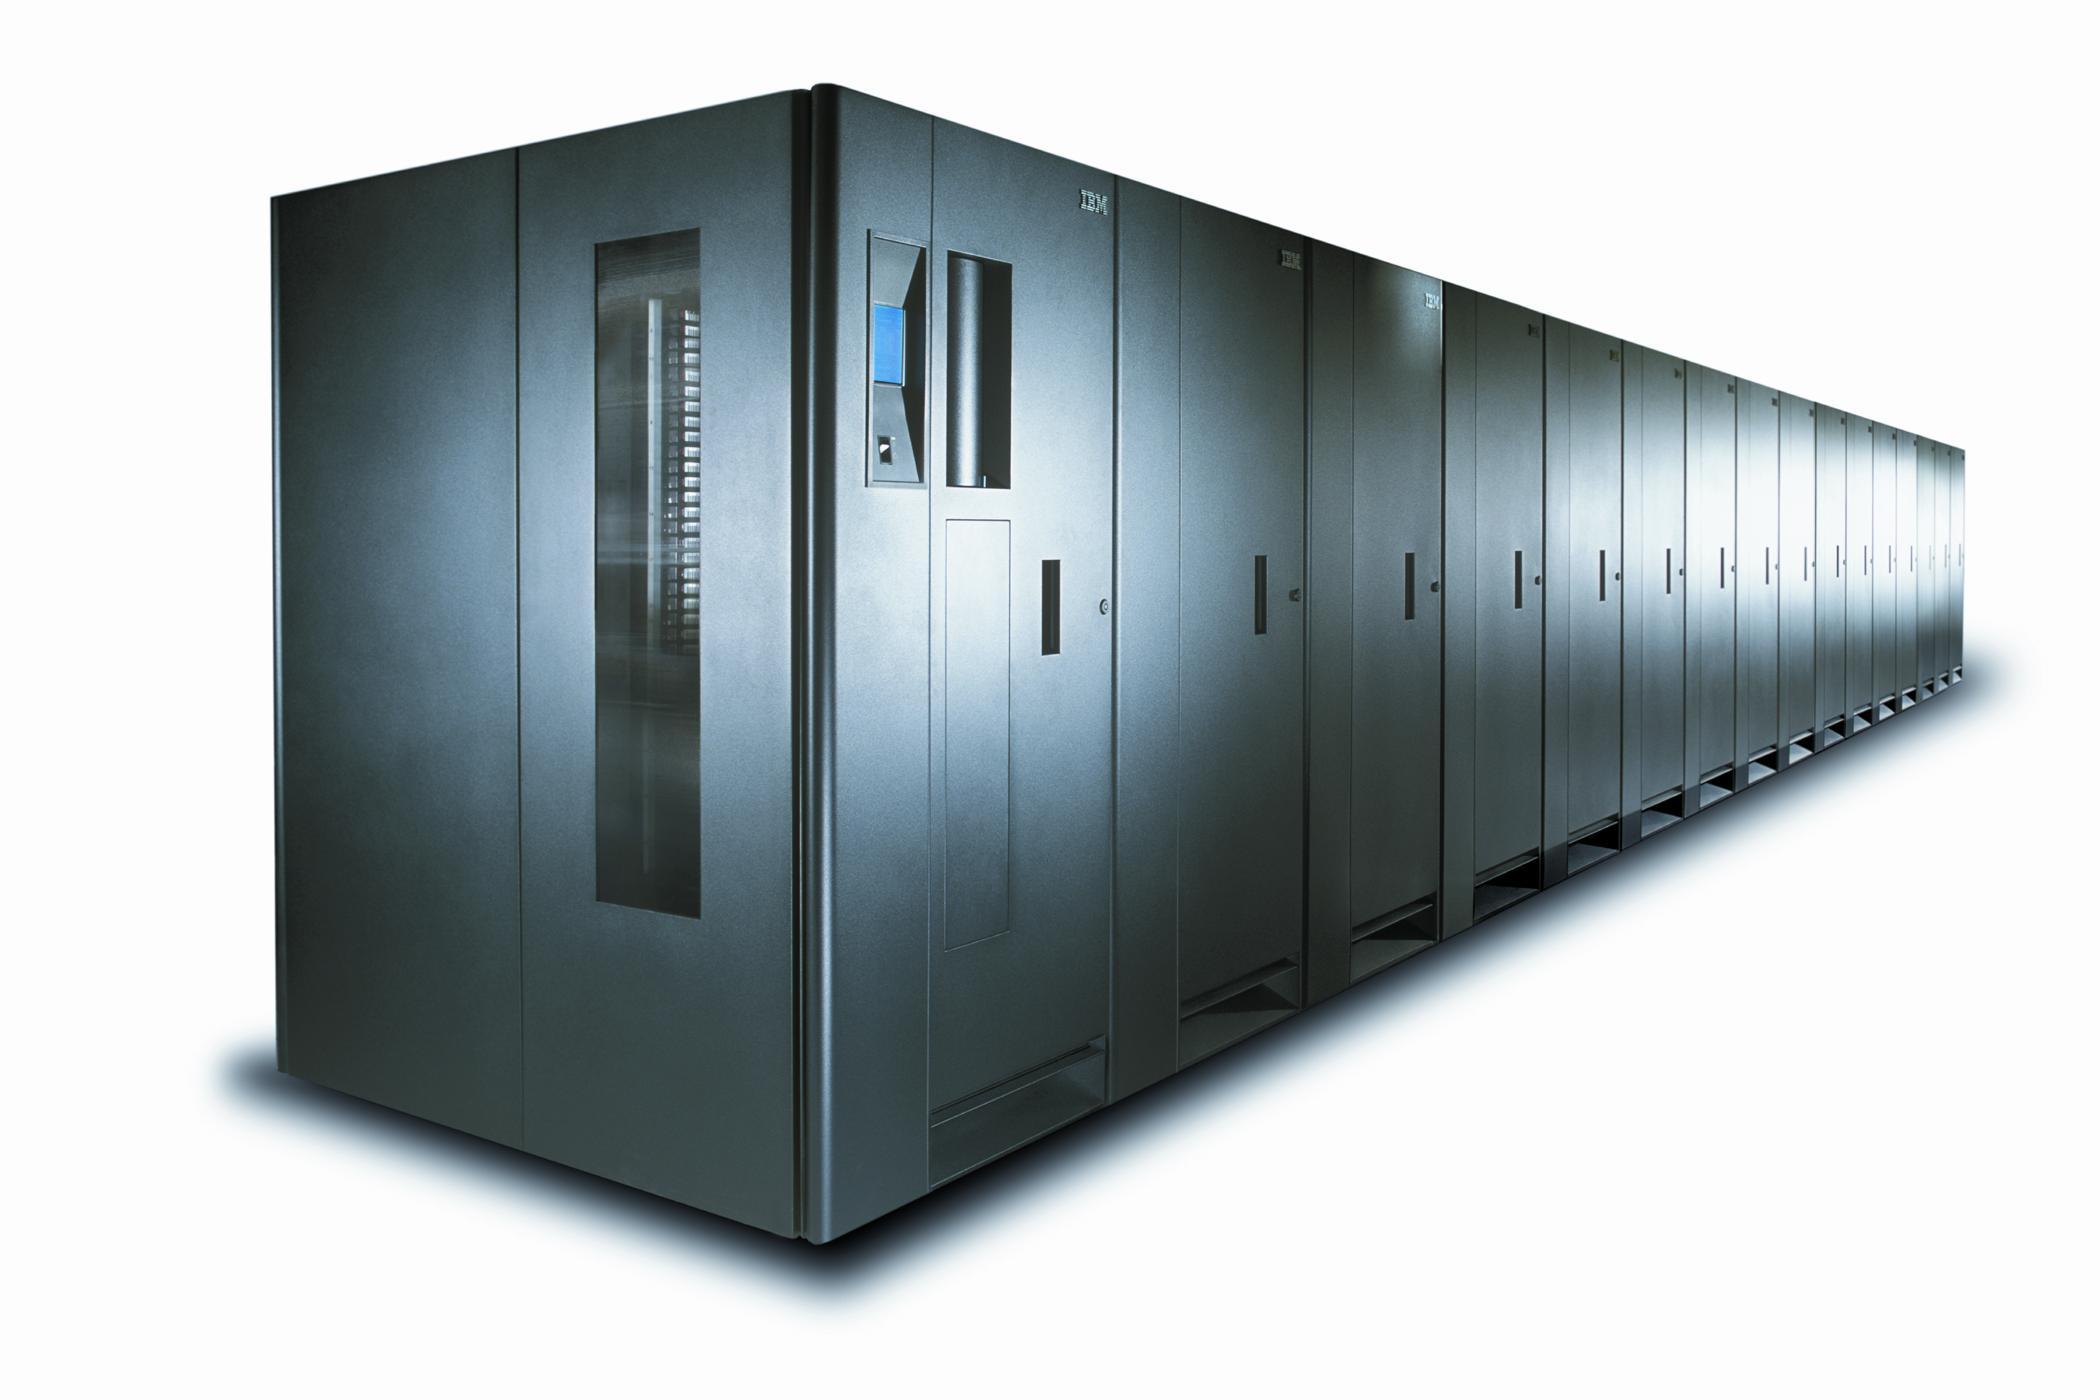 IBM TS3500 テープライブラリー